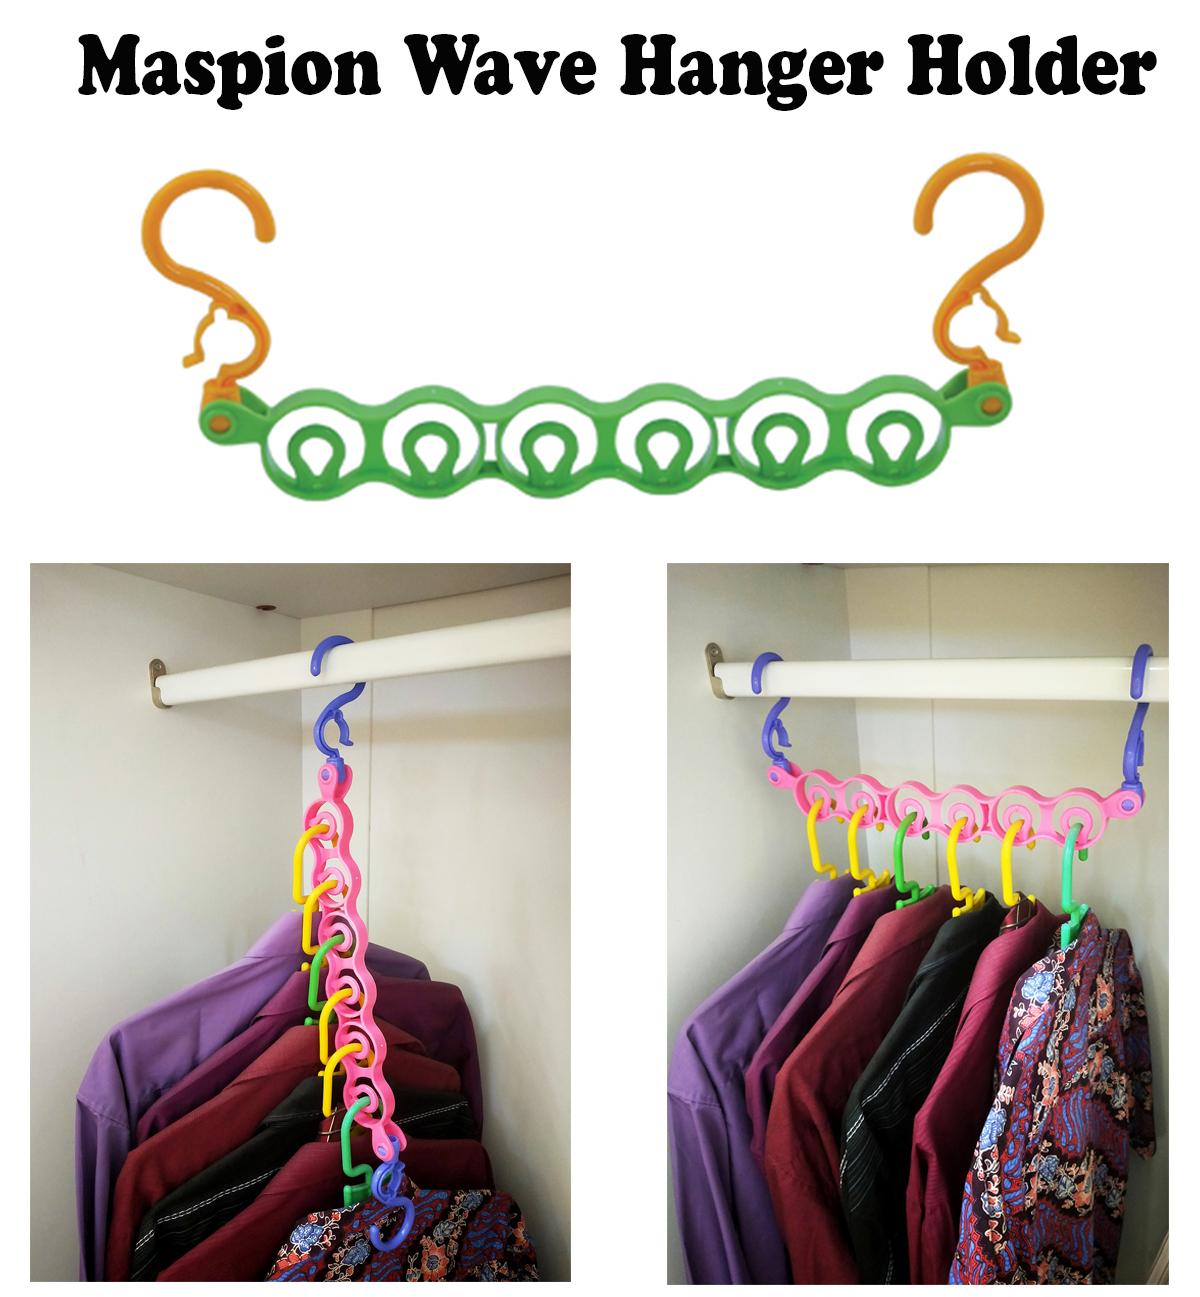 maspion magic wave hanger holder gantungan pakaian baju